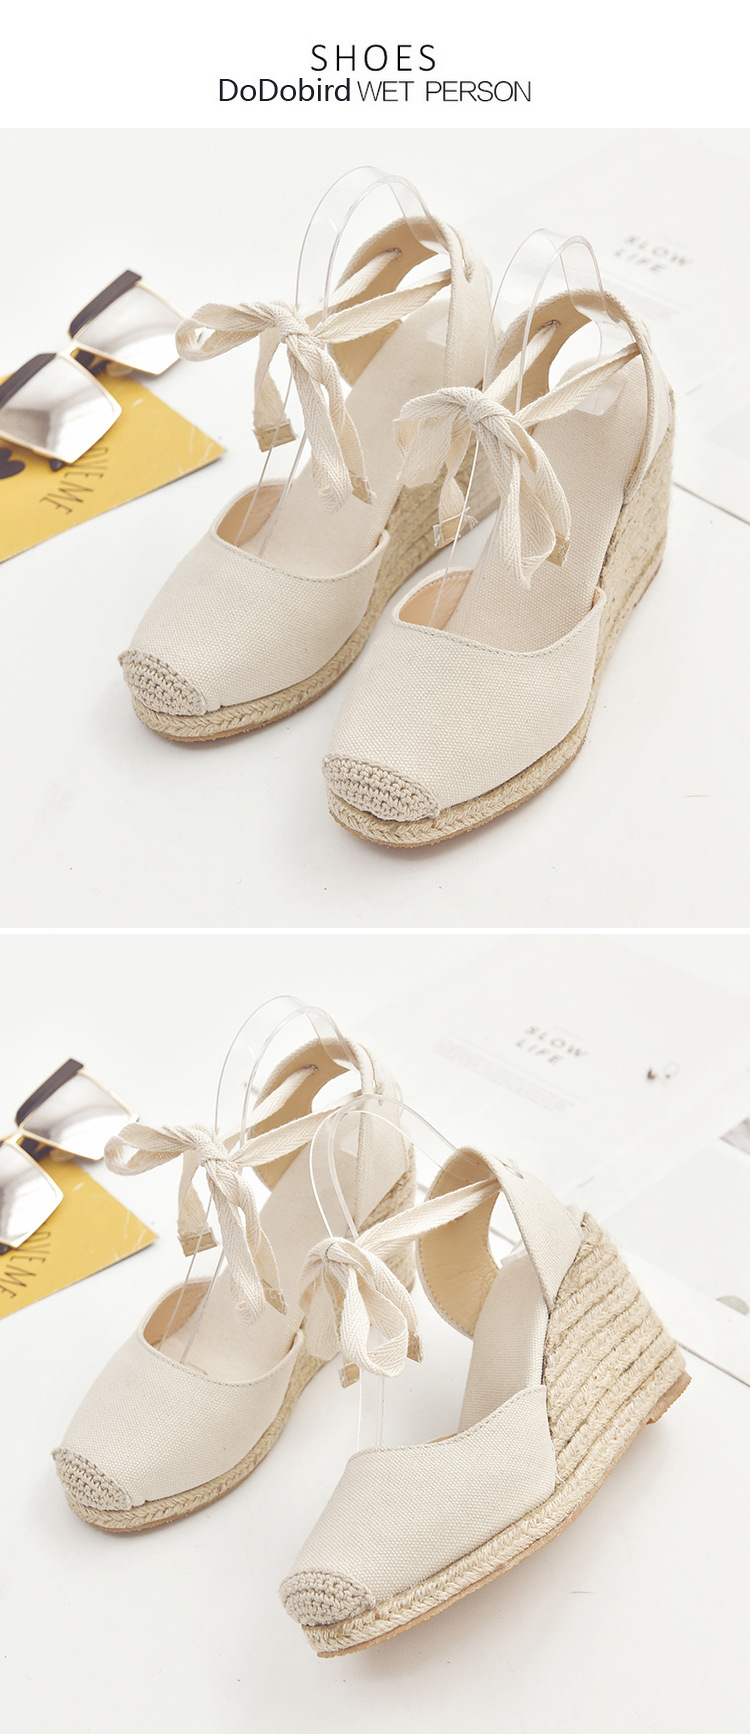 HTB1QTYQaiHrK1Rjy0Flq6AsaFXa6 Women's Espadrille Ankle Strap Sandals Comfortable Slippers Ladies Womens Casual Shoes Breathable Flax Hemp Canvas Pumps